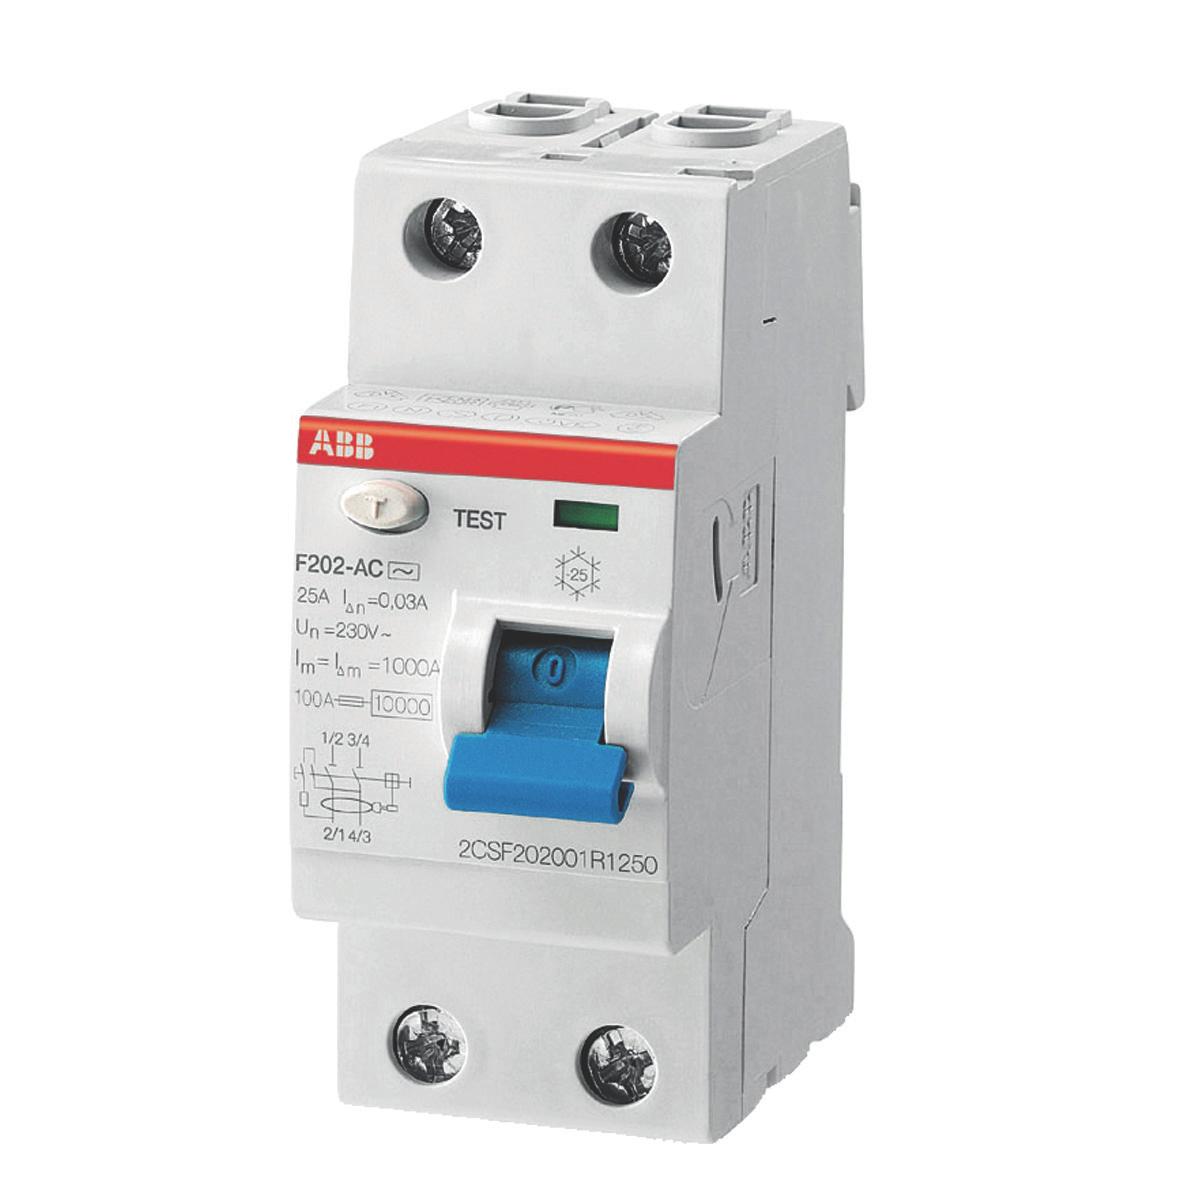 ABB F202AC-25/0.03 Residual Current Circuit Breaker